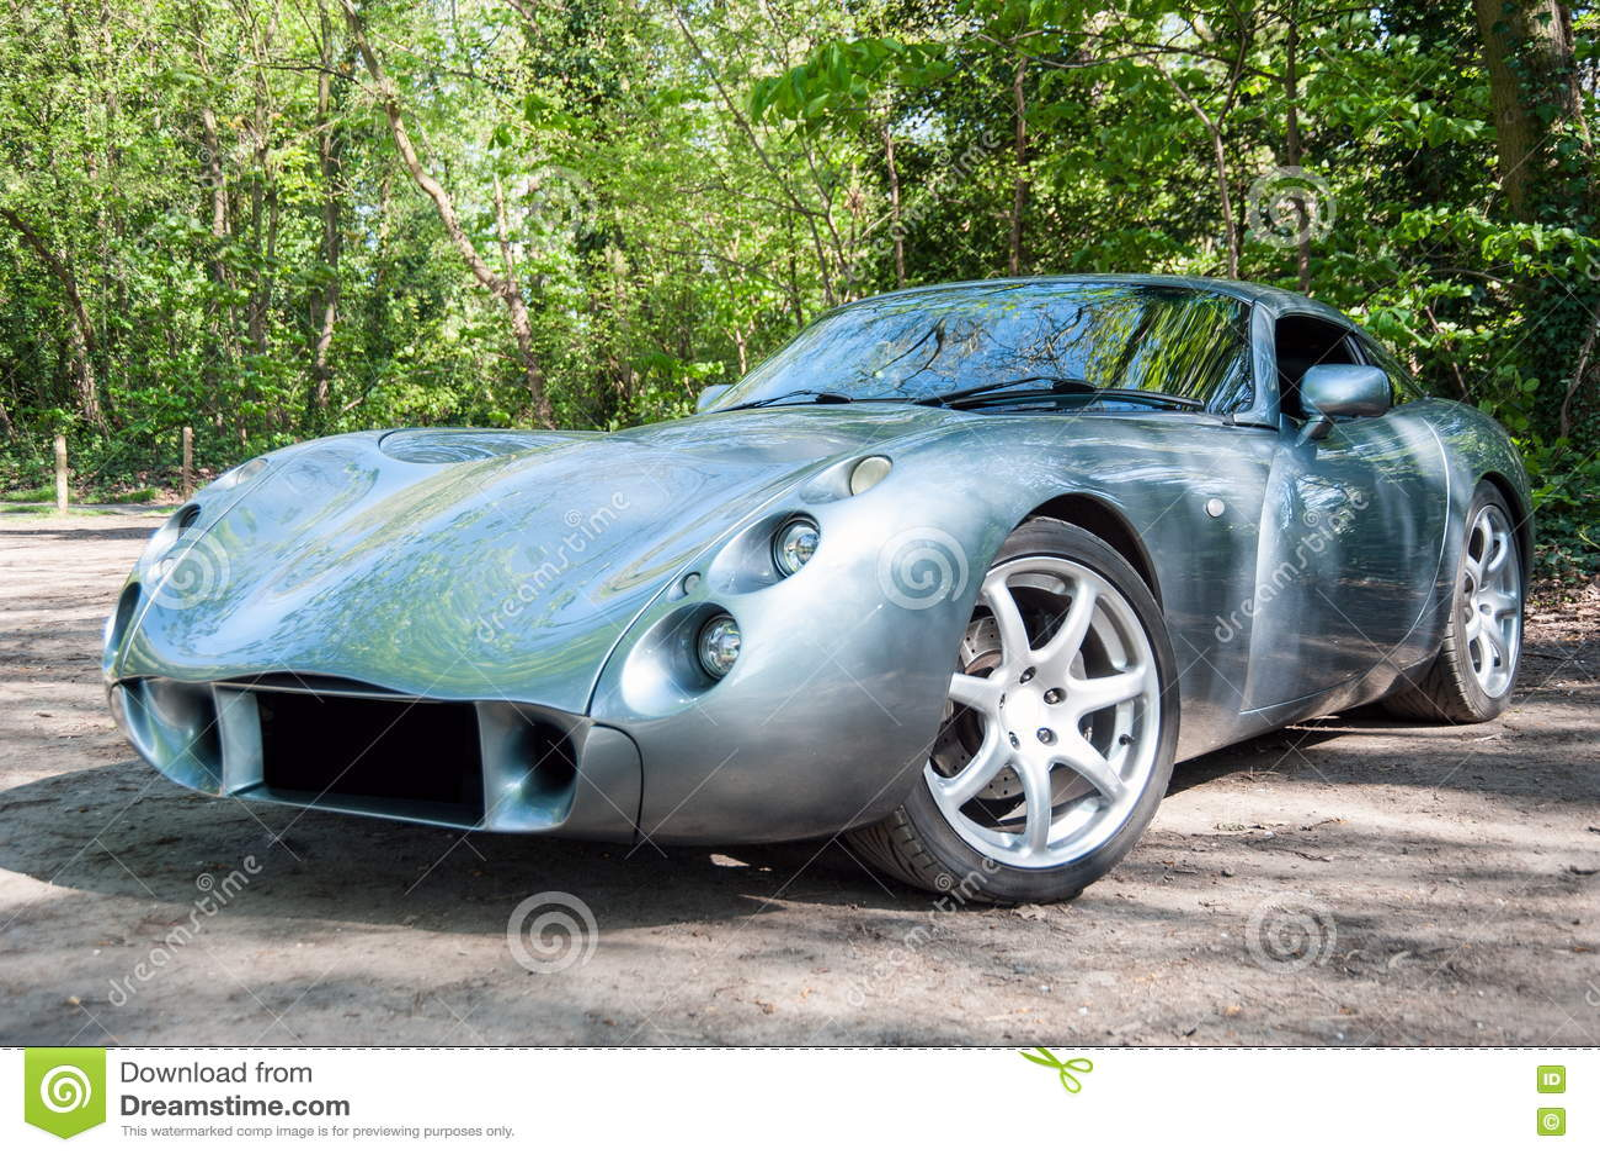 voiture de sport anglaise toscane de tvr image stock image du cher vite 76663781. Black Bedroom Furniture Sets. Home Design Ideas